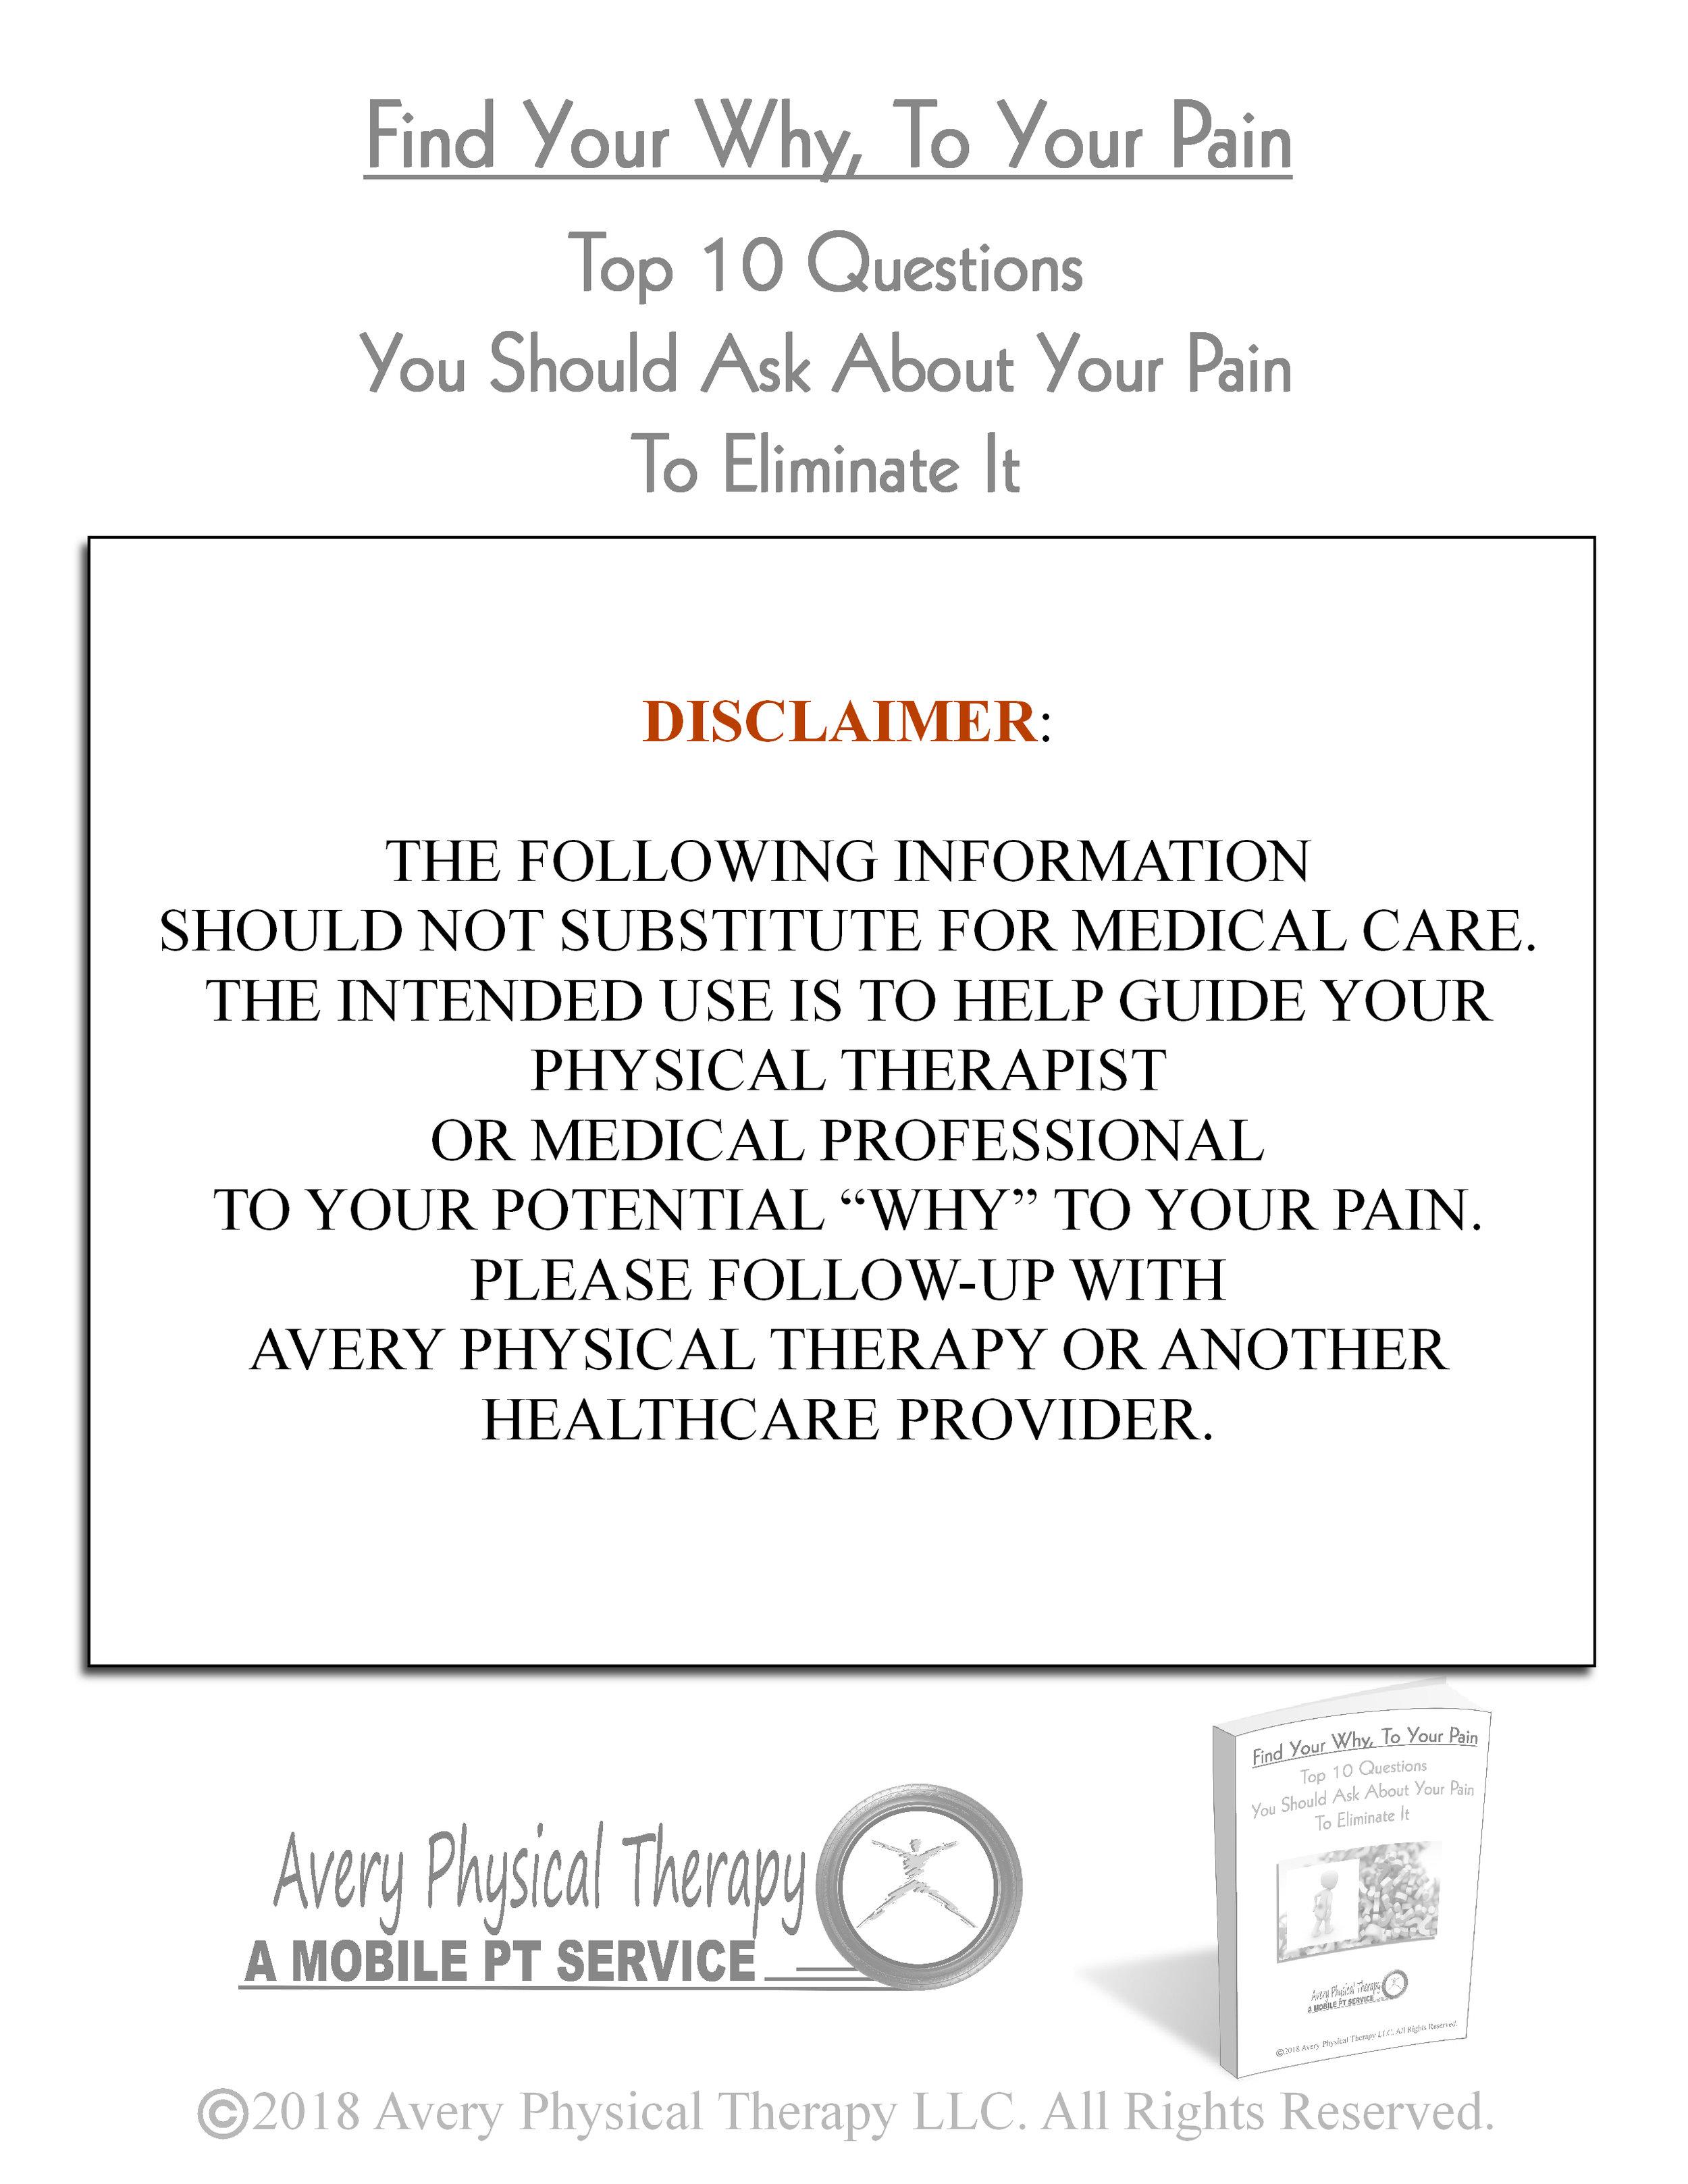 Top 10 Pain Questions 1-3C.JPG